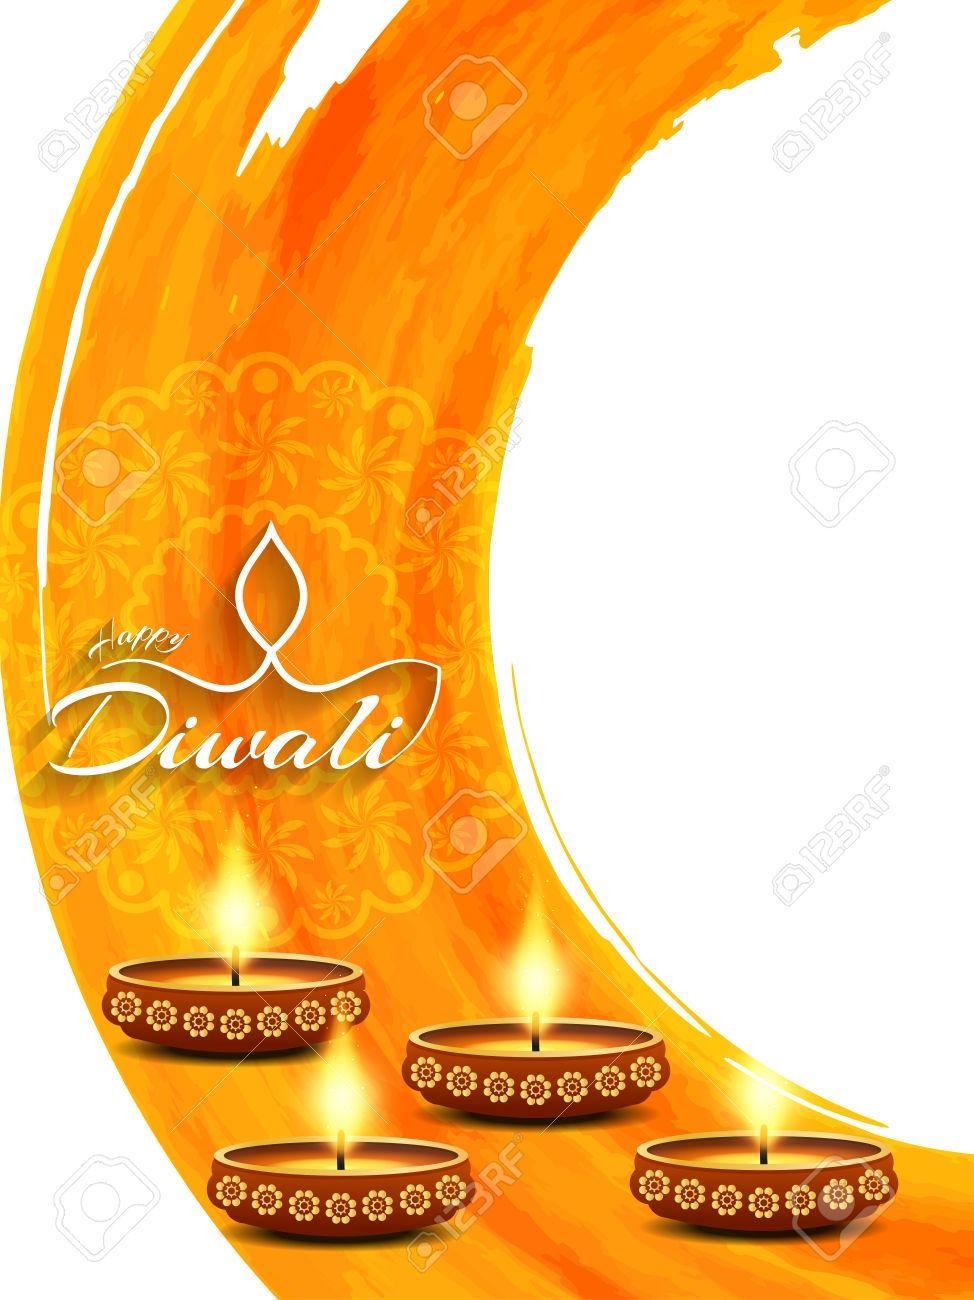 New diwali background designs vector free download.